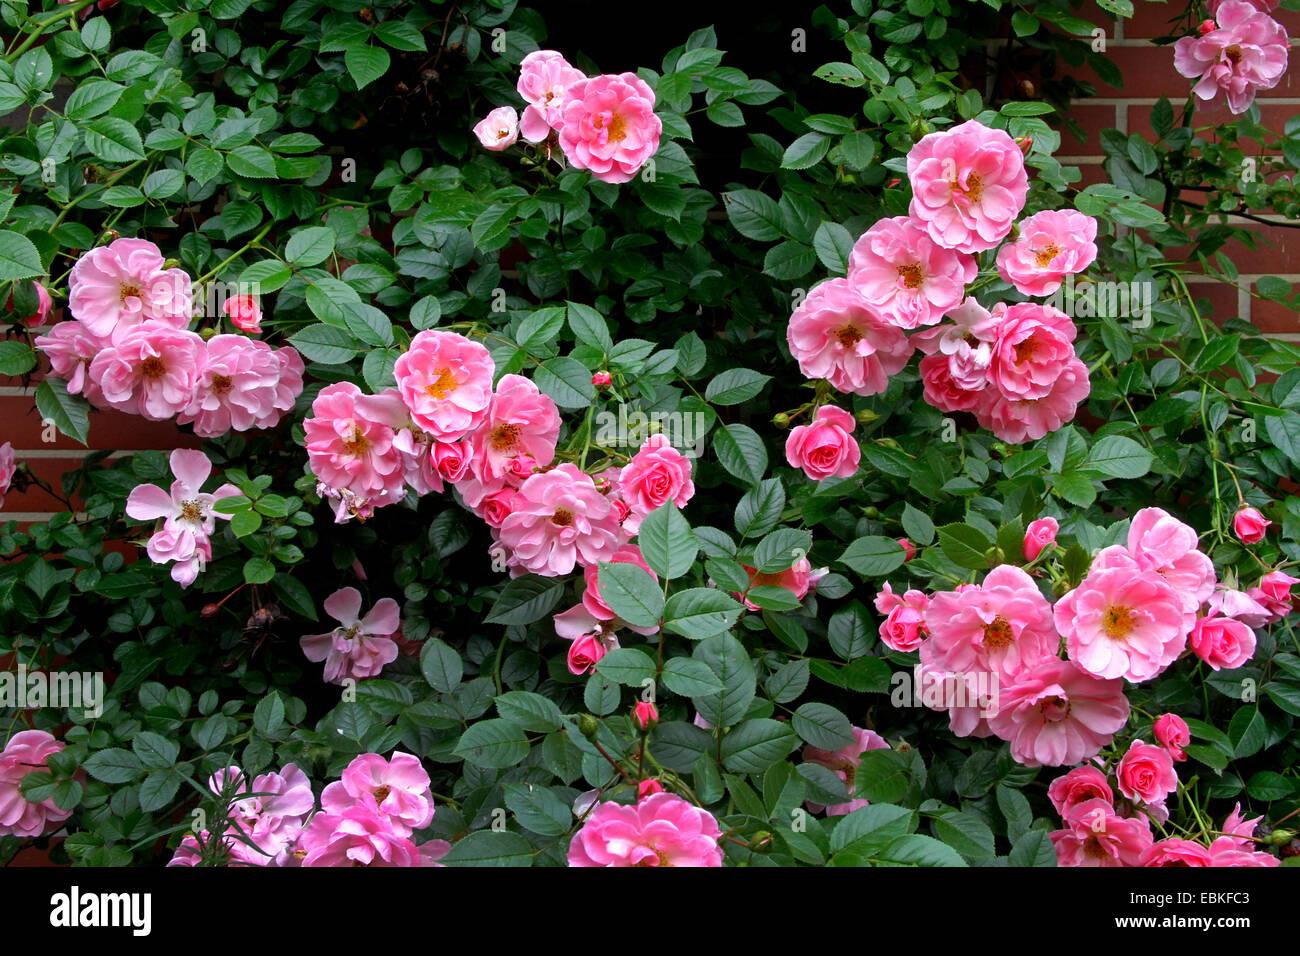 rambler rose on a cladding, Germany, North Rhine-Westphalia - Stock Image